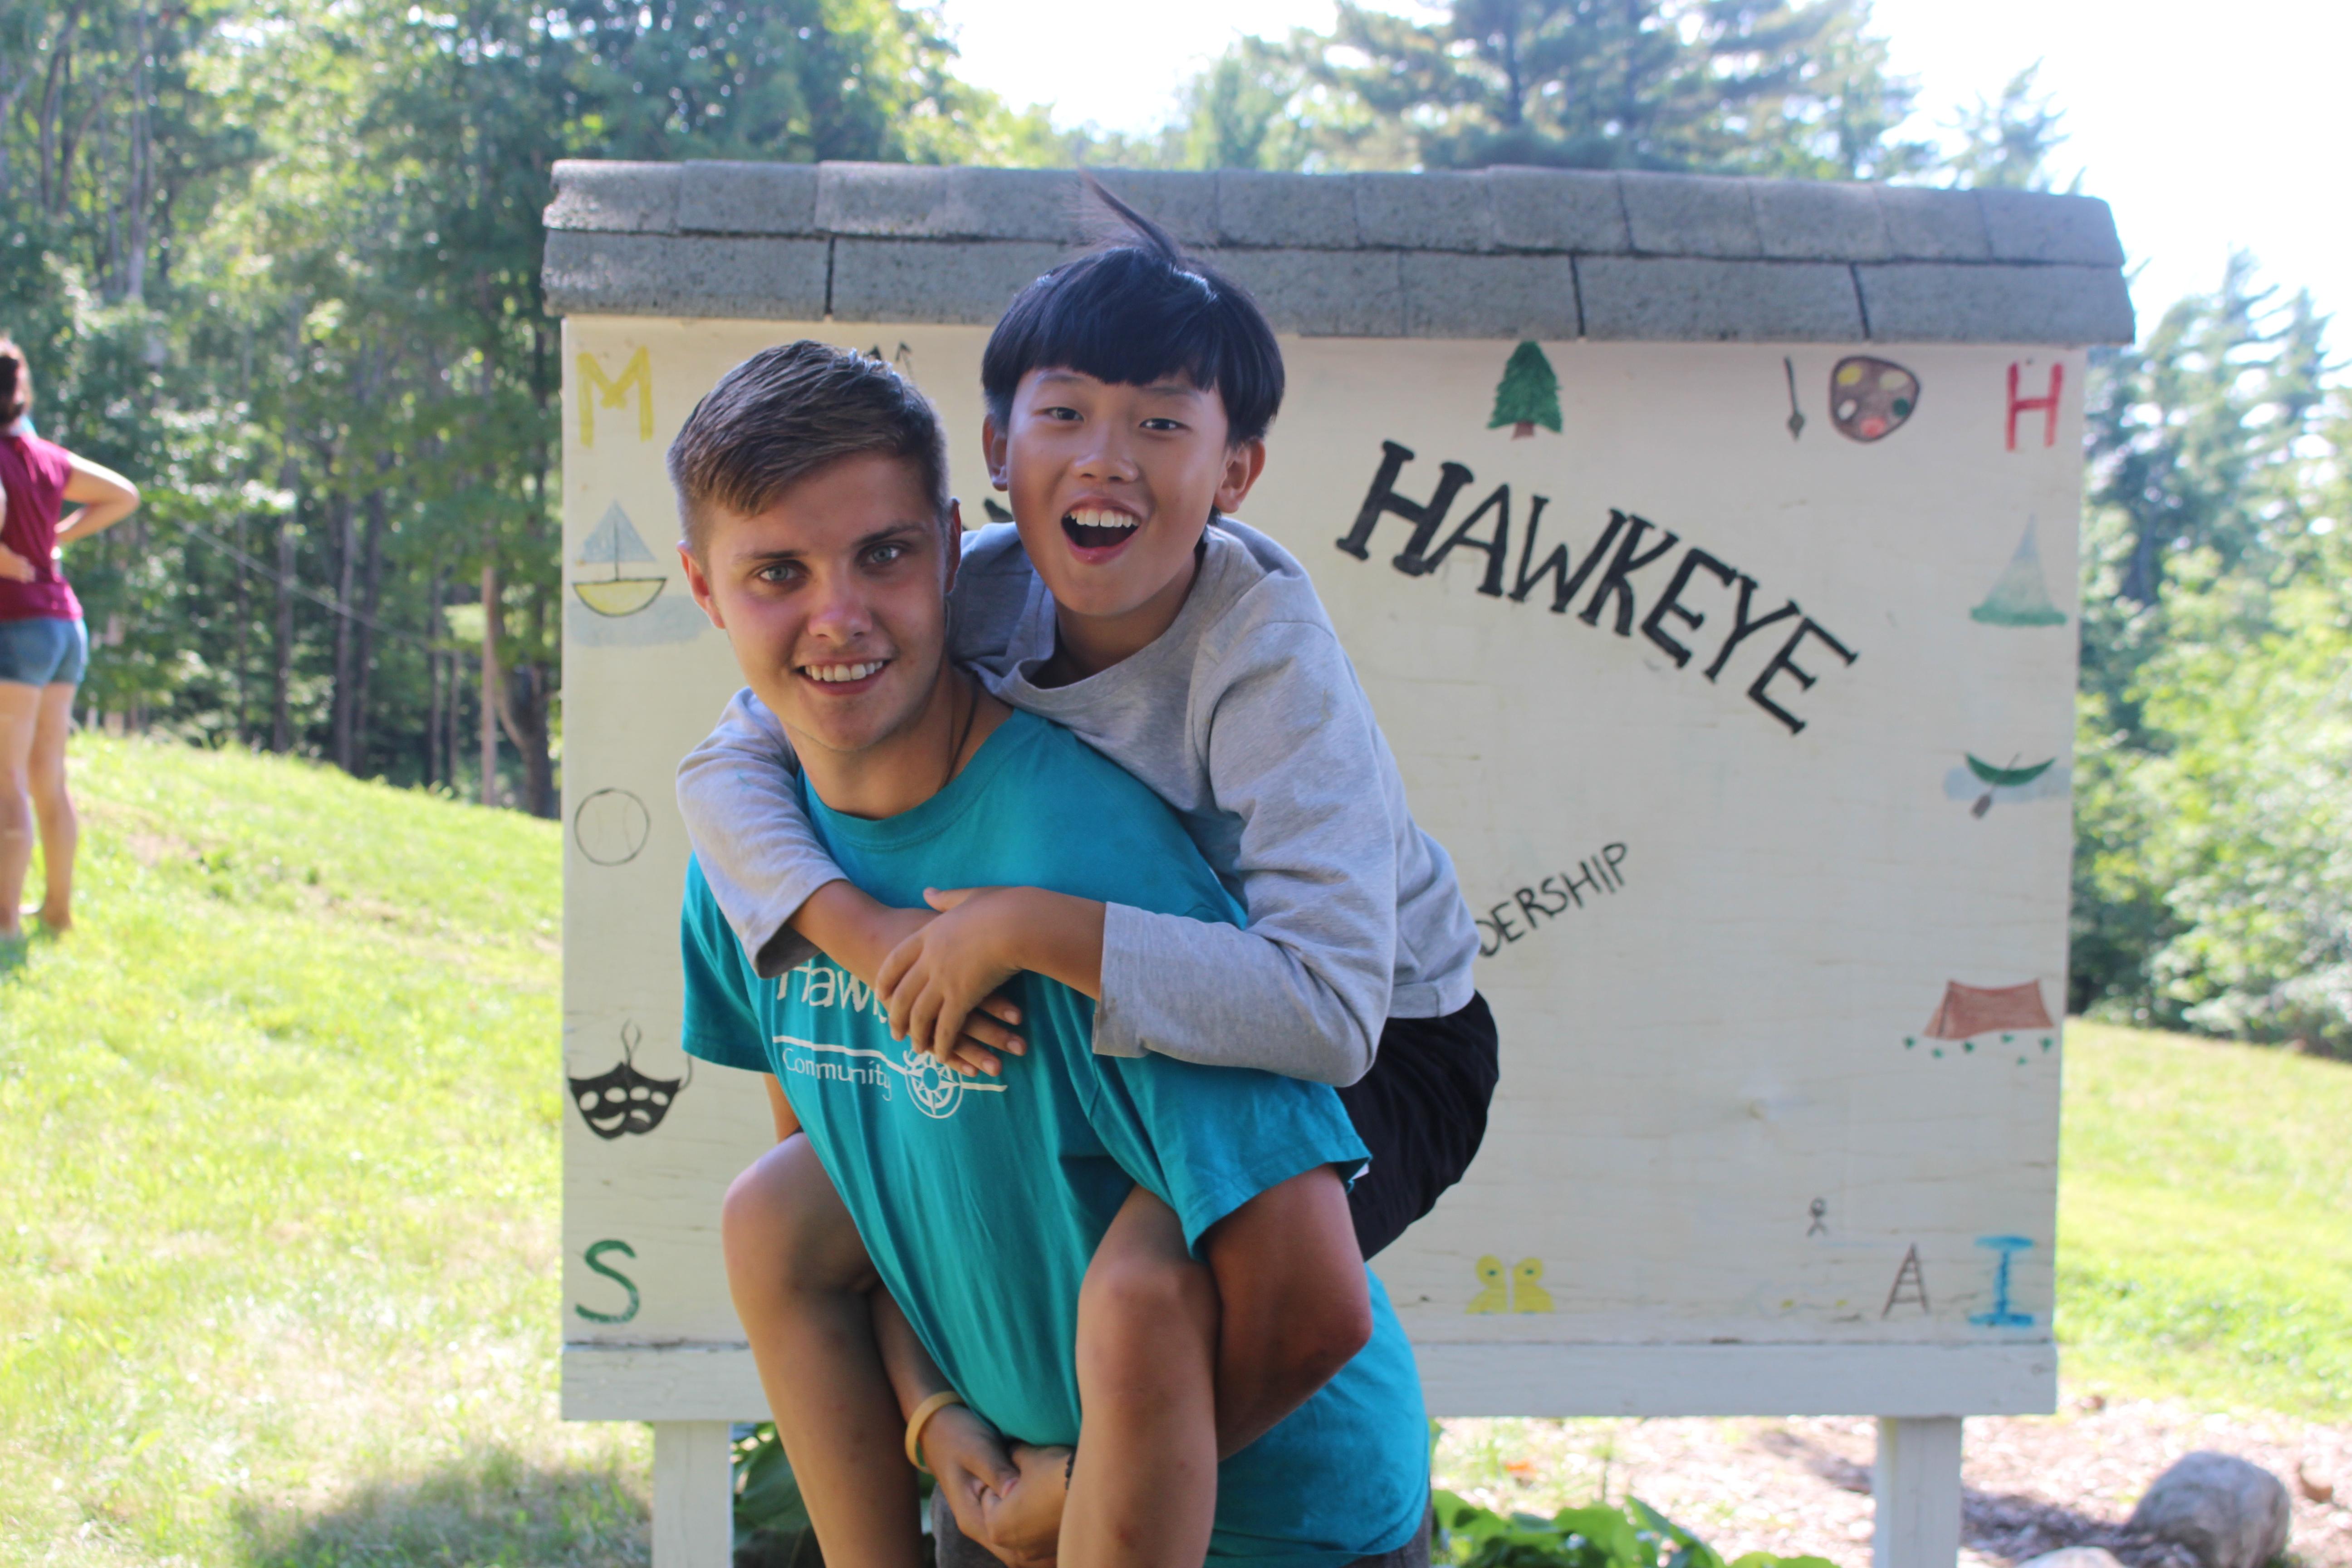 Summer Program - Kayaking | Camp Hawkeye